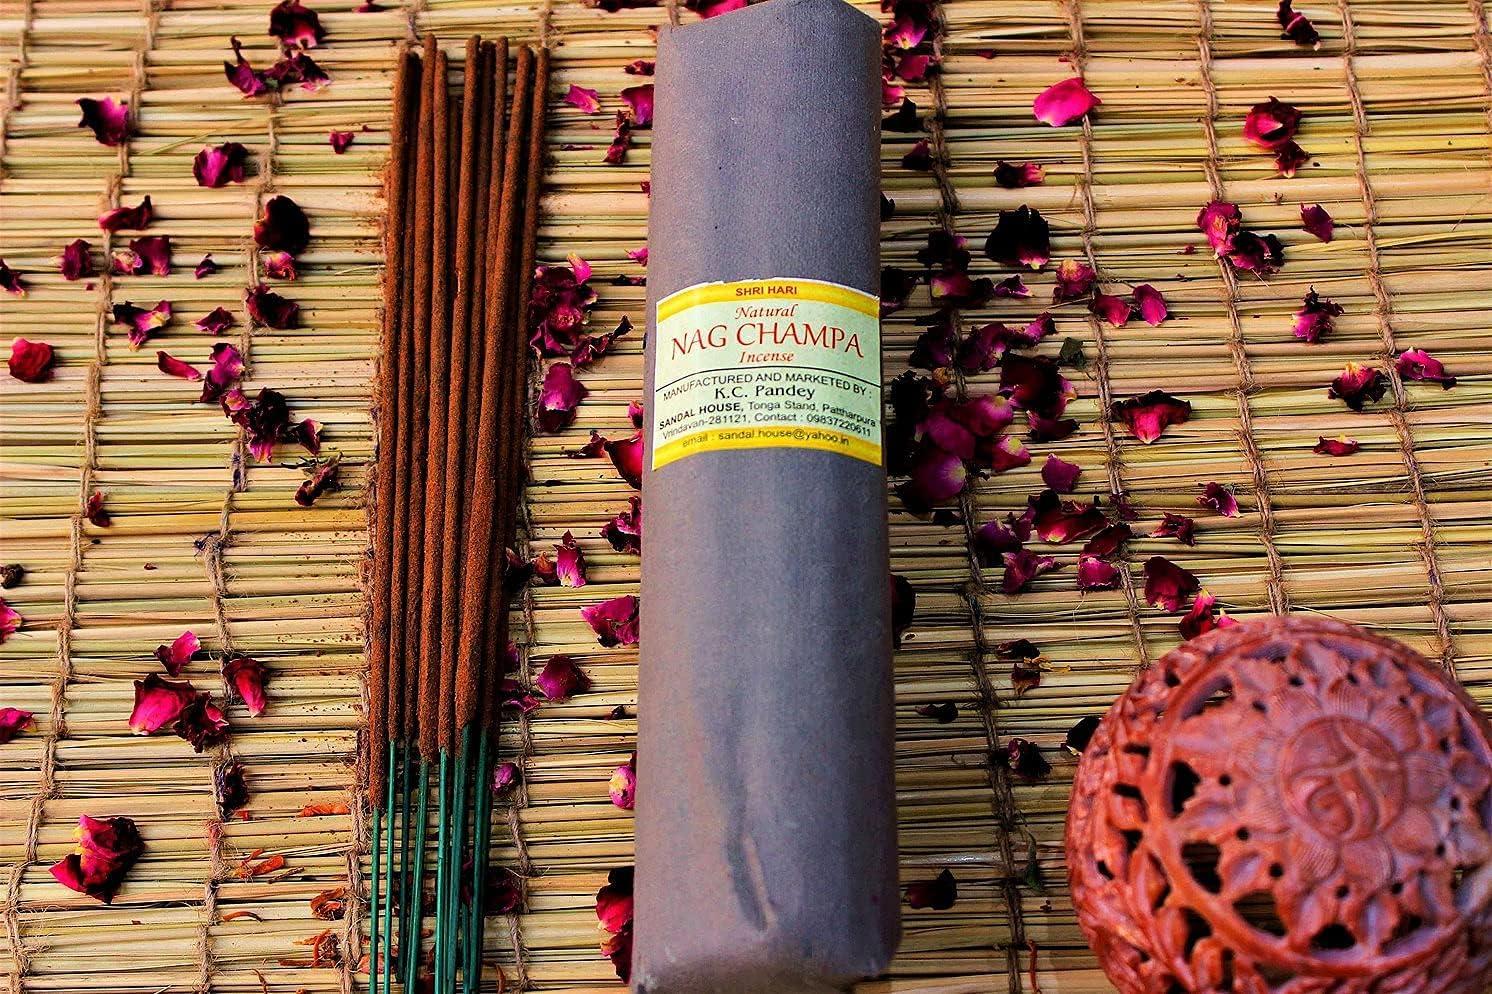 Devgandha Nag Champa Natural Incense Agarbatti o Sticks Pack Discount mail order Max 44% OFF